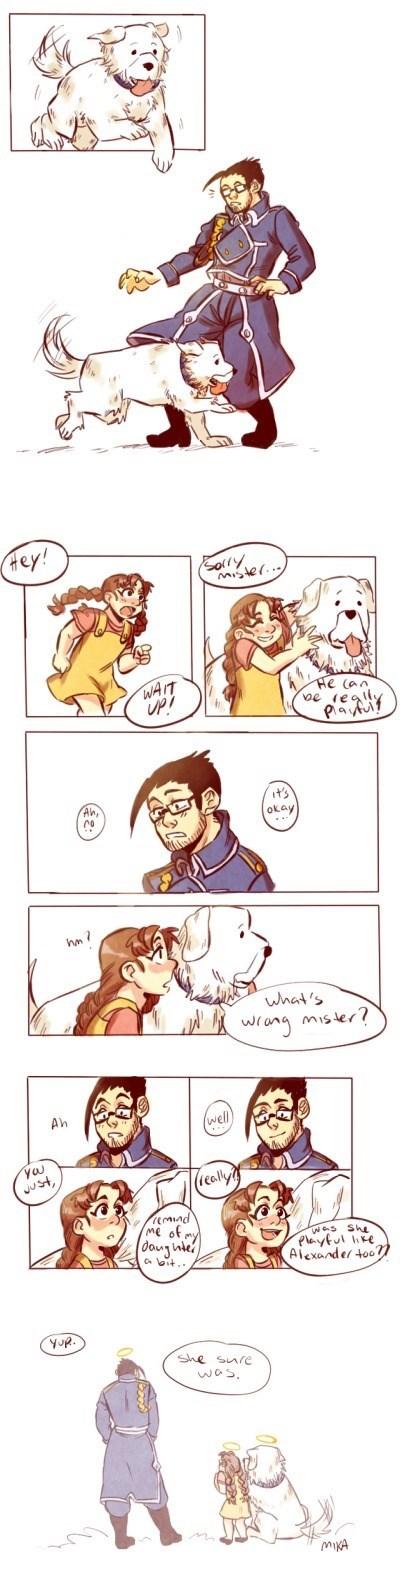 anime memes maes hughes nina alexander in heaven